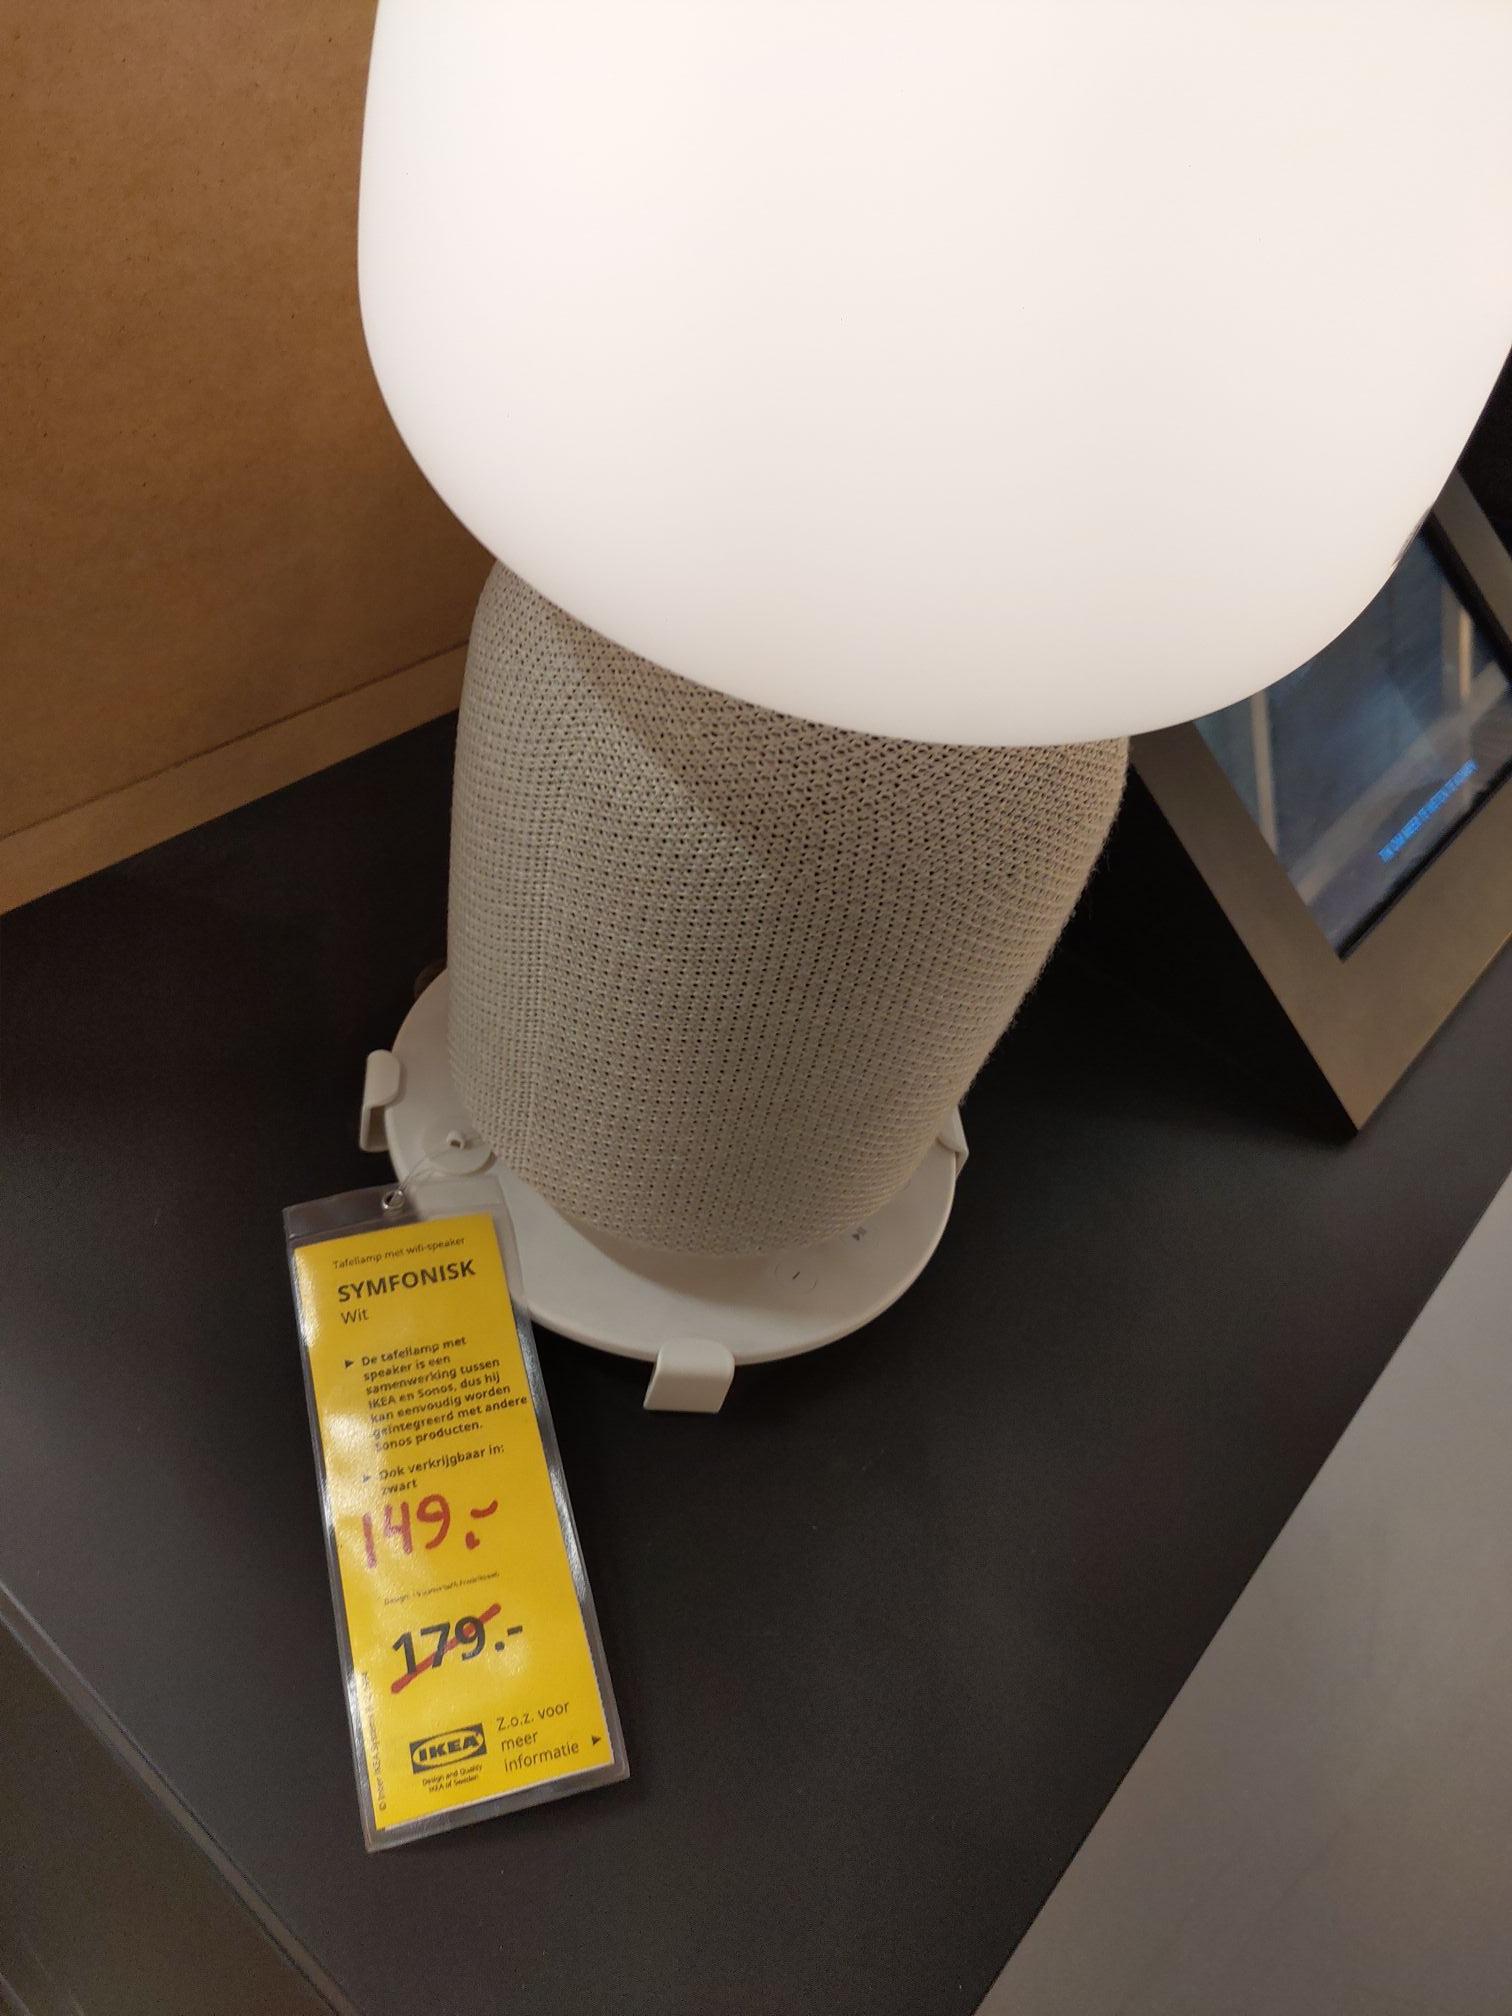 Ikea Symfonisk tafellamp speaker - zwart & wit